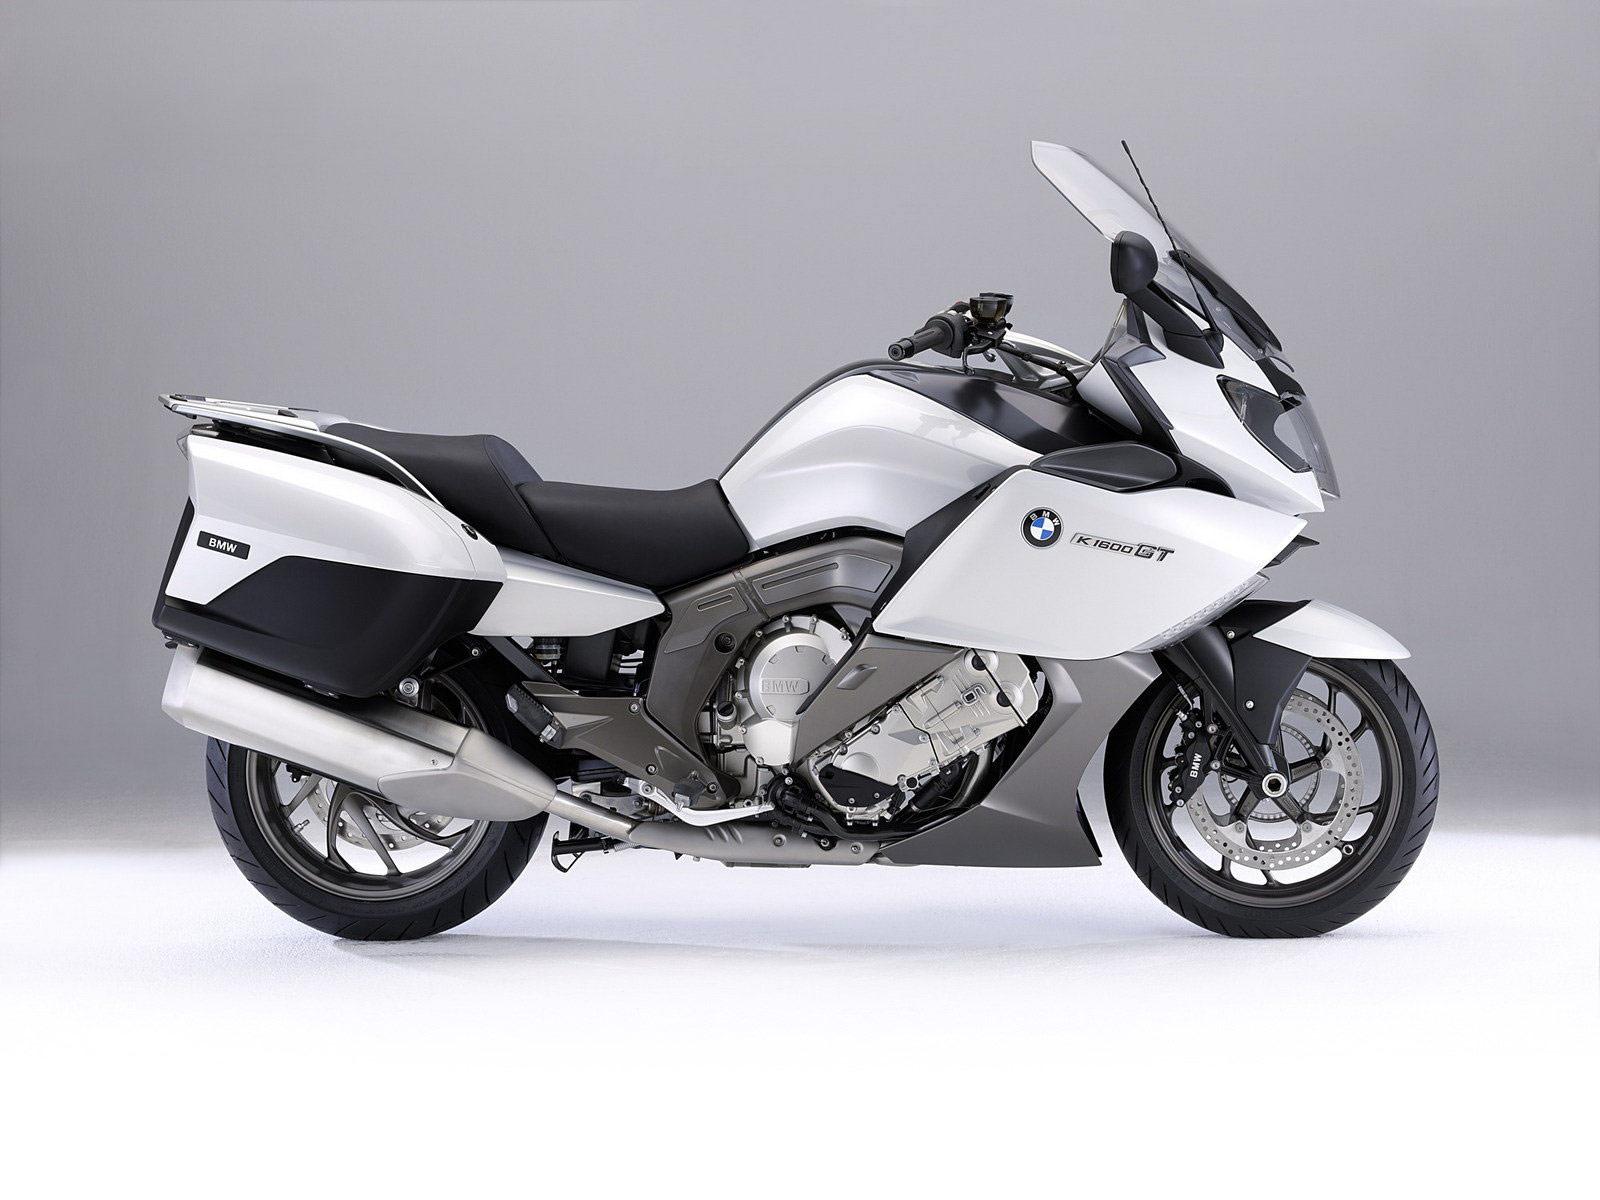 bmw motorcycle recall, 2012 k1600gt and k1600gtl | biker news online